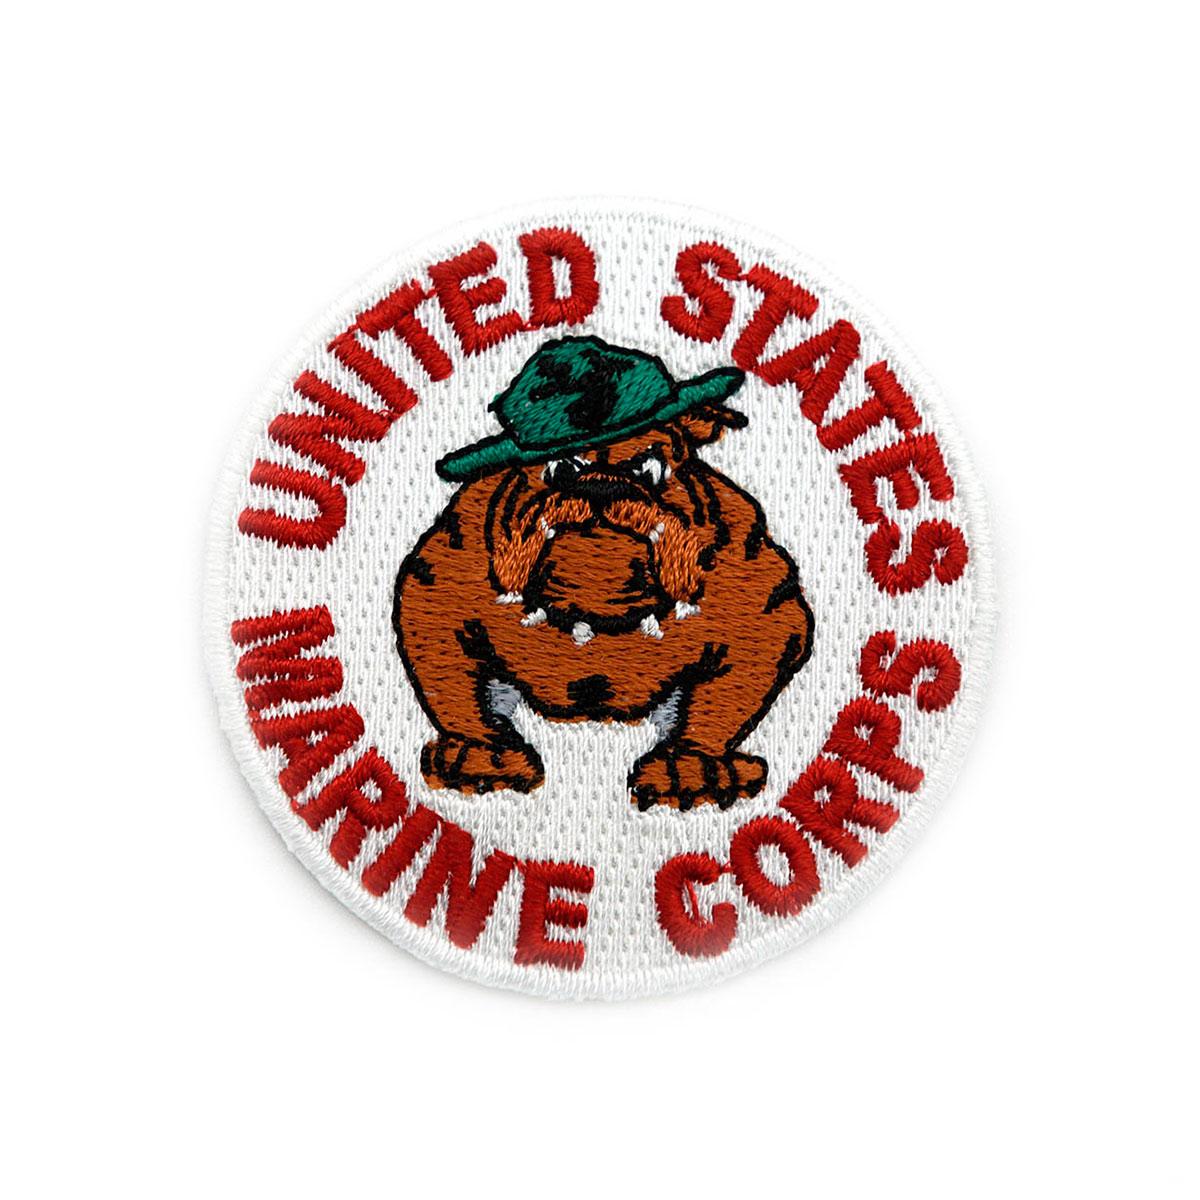 AD1004 Термоаппликация 'Marine Corps United States', d 5,5 см, Hobby&Pro